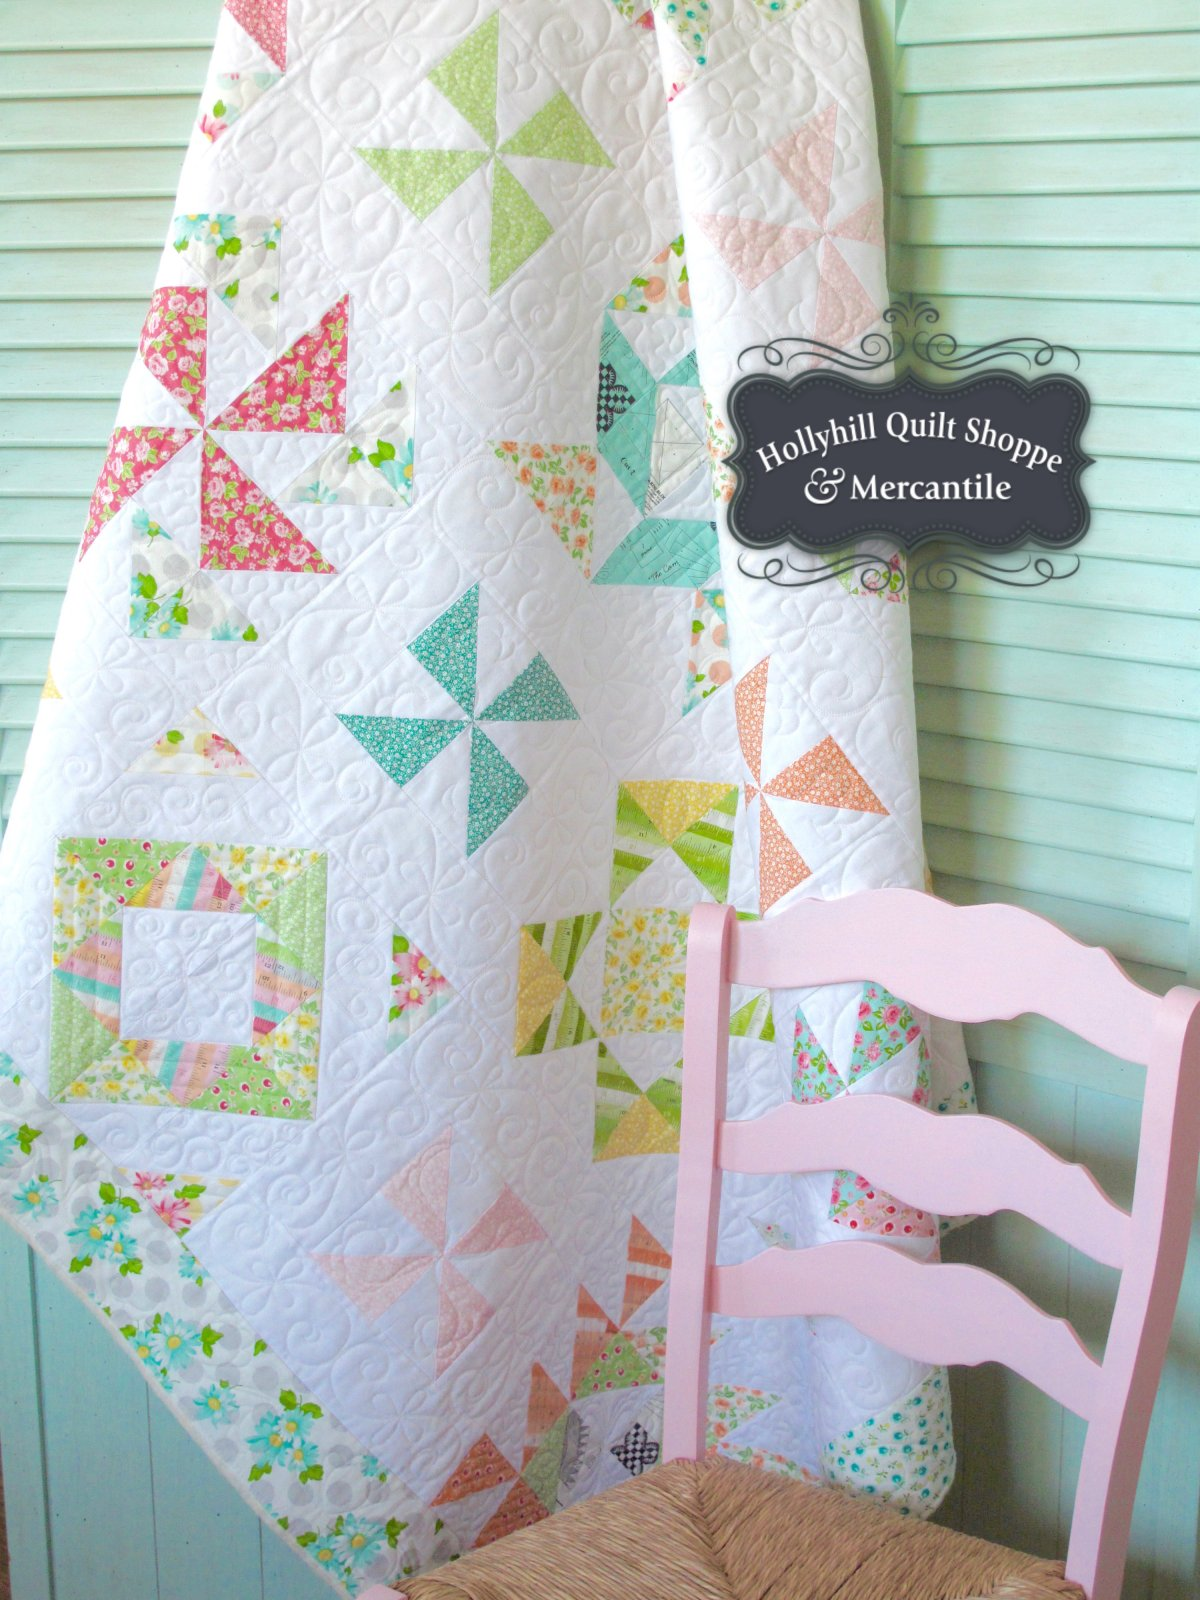 Sew & Sew Quilt Kit